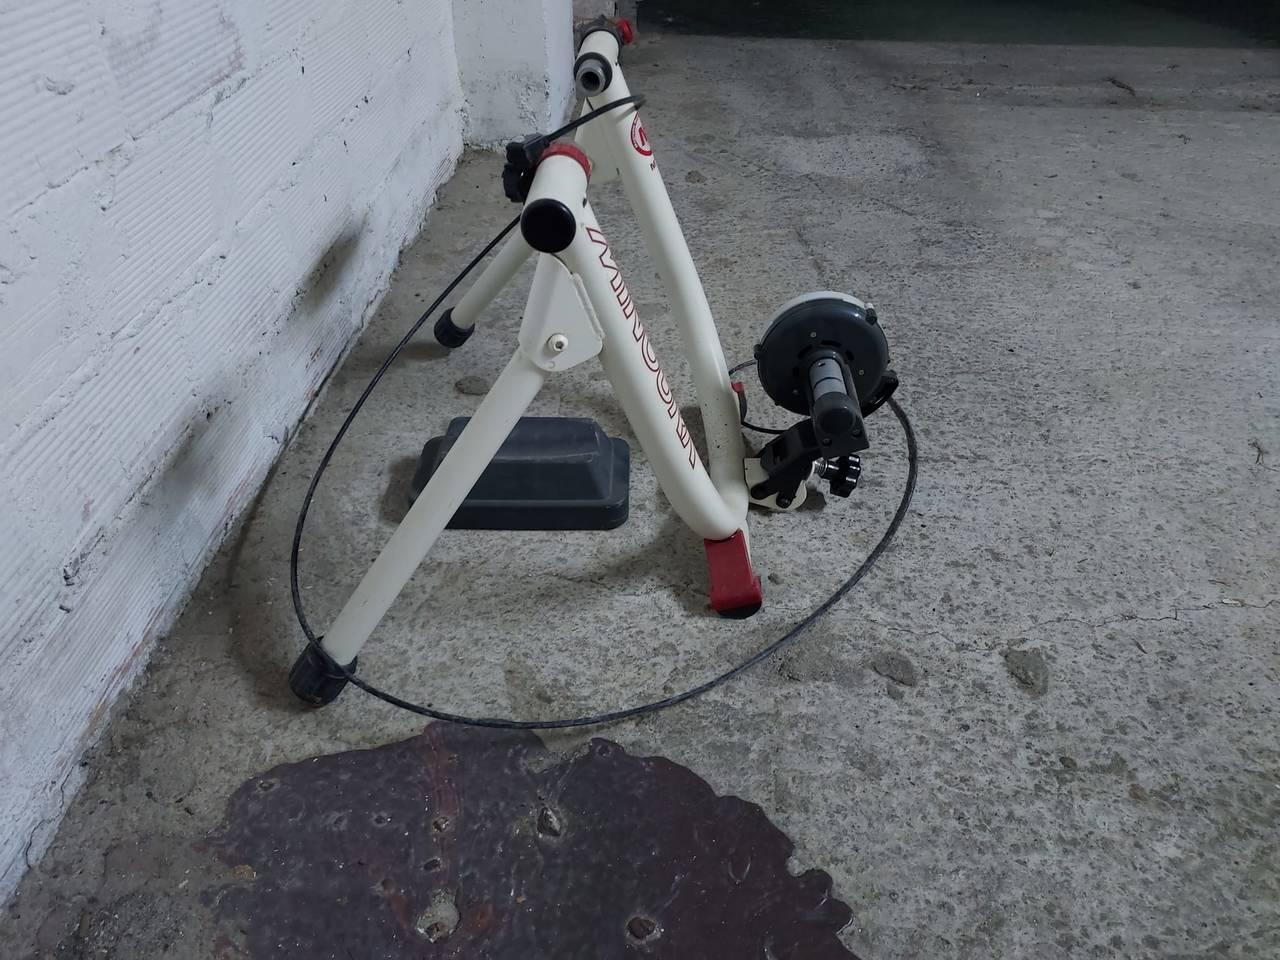 Rodillo de entrenamiento bicicleta.  - Foto 8